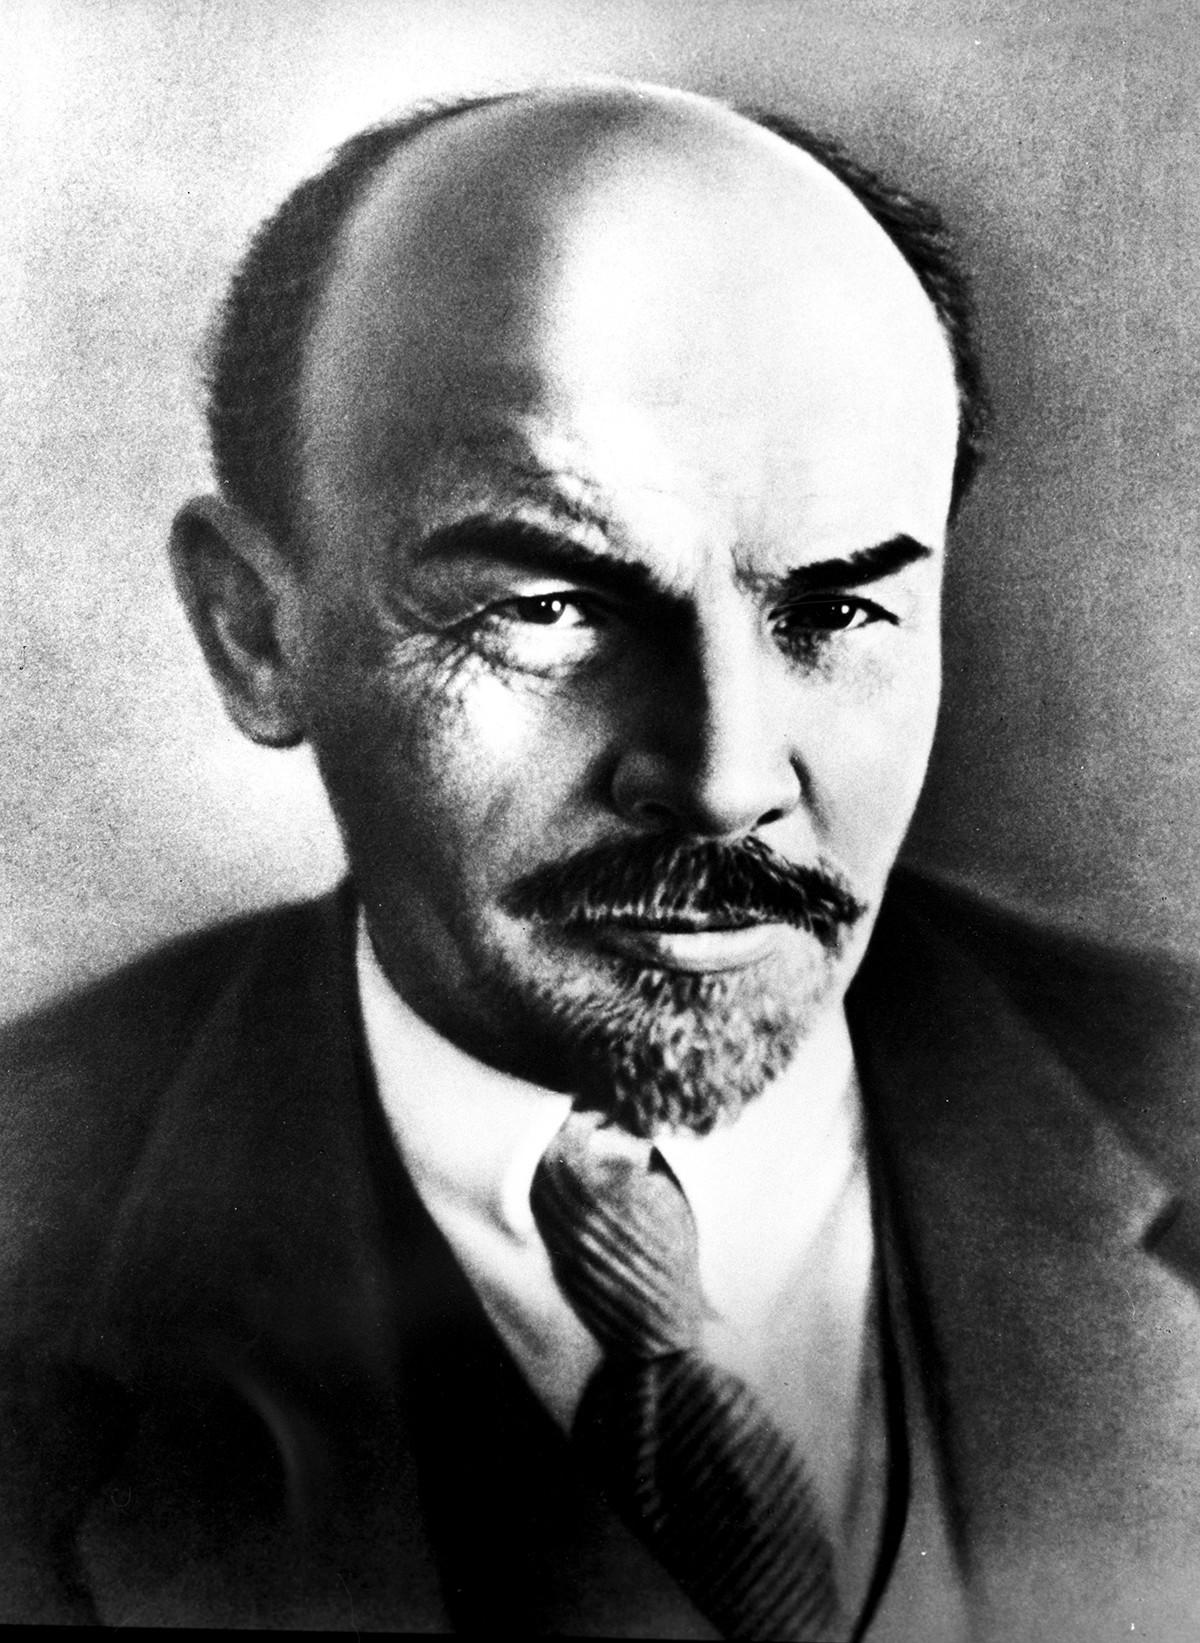 Wladimir Lenin, 1918